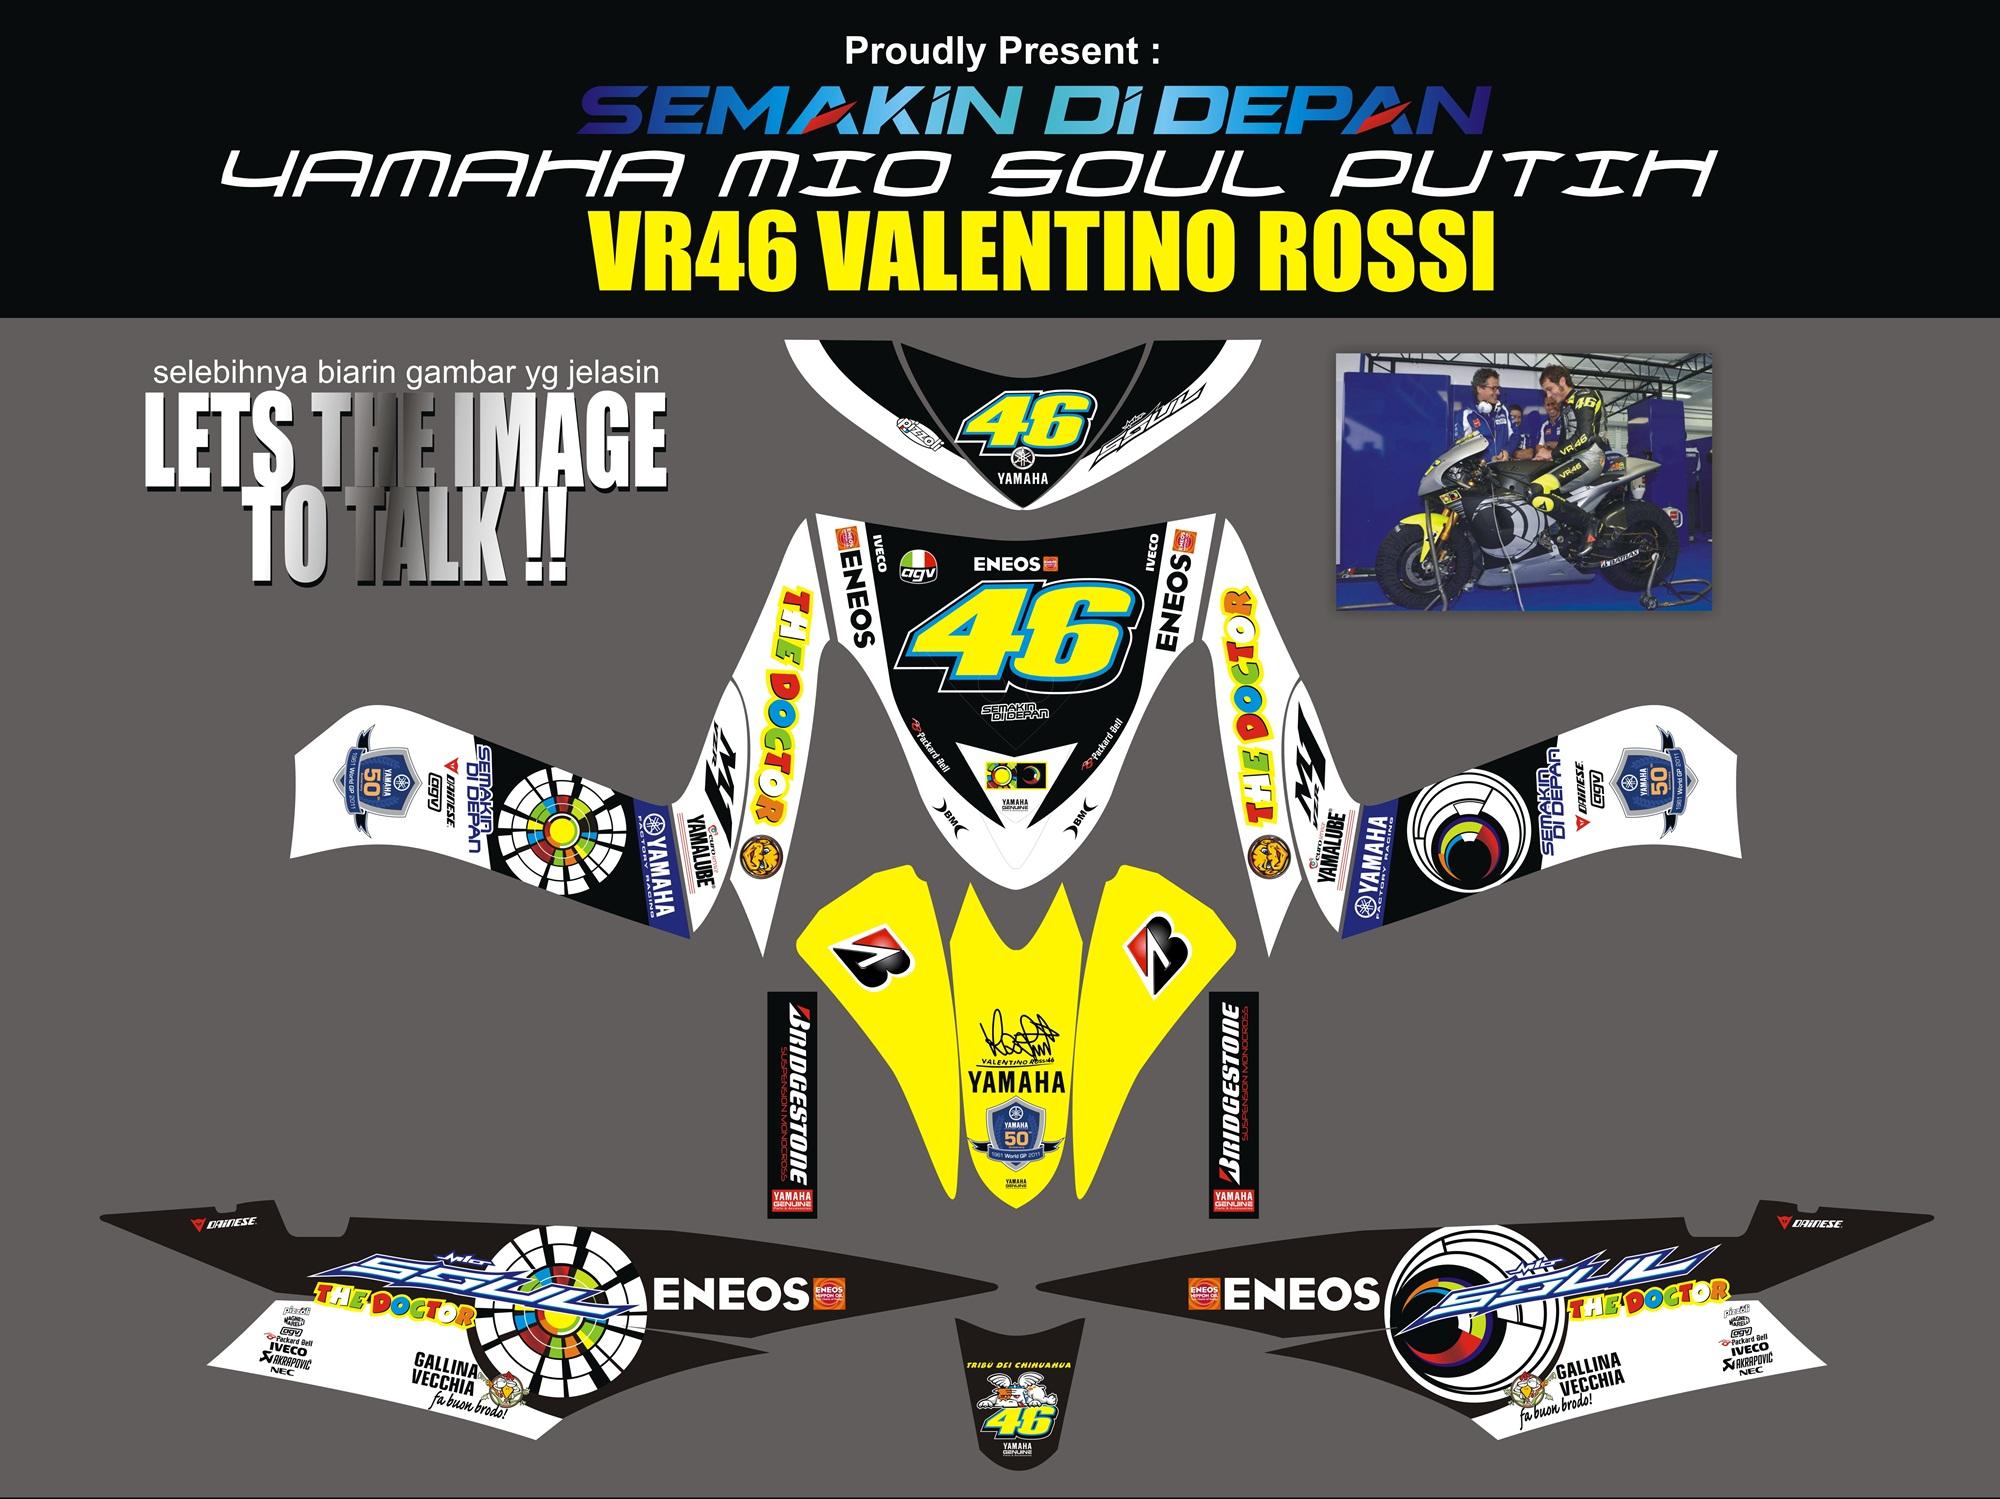 Striping Motor Mio Soul Valentino Rossi | Apien Sticker